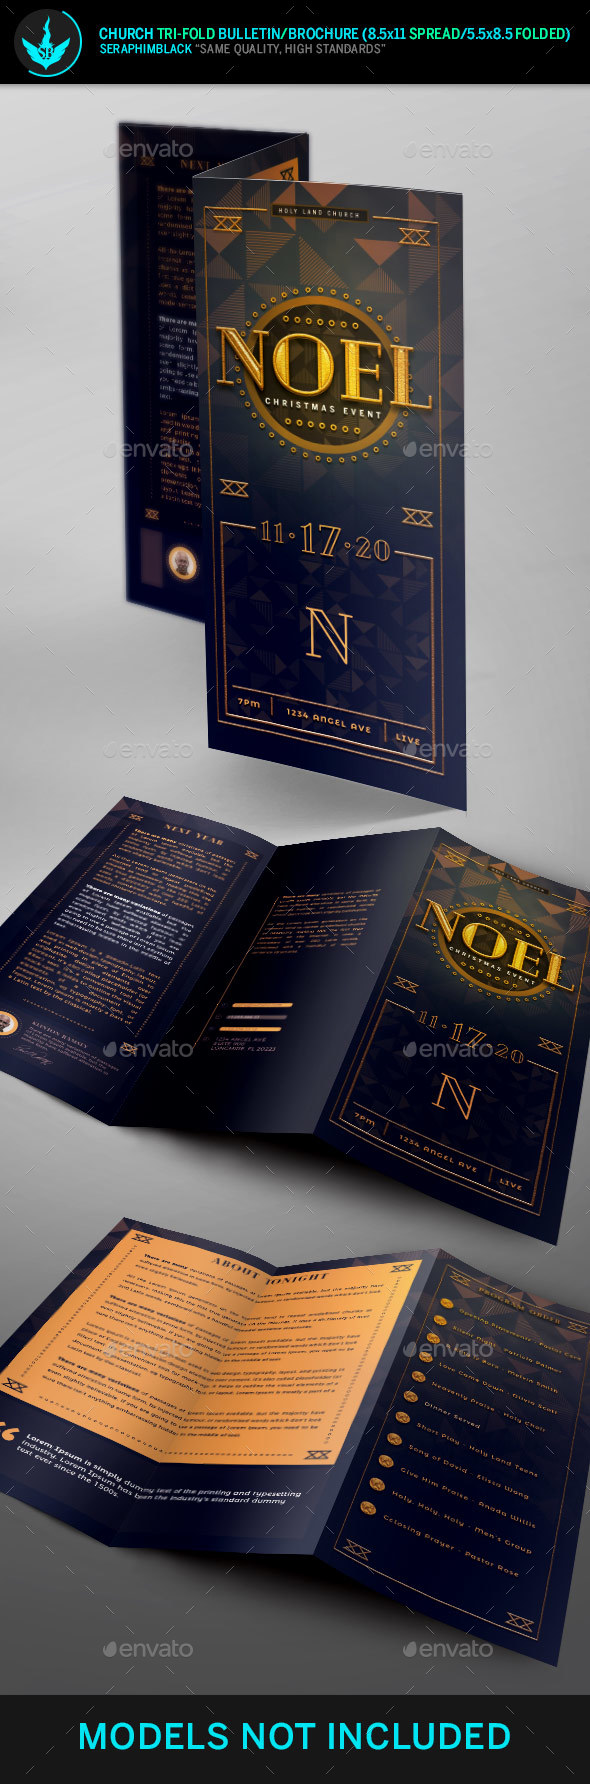 Noel Christmas Gala Tri-Fold  Program Template - Informational Brochures